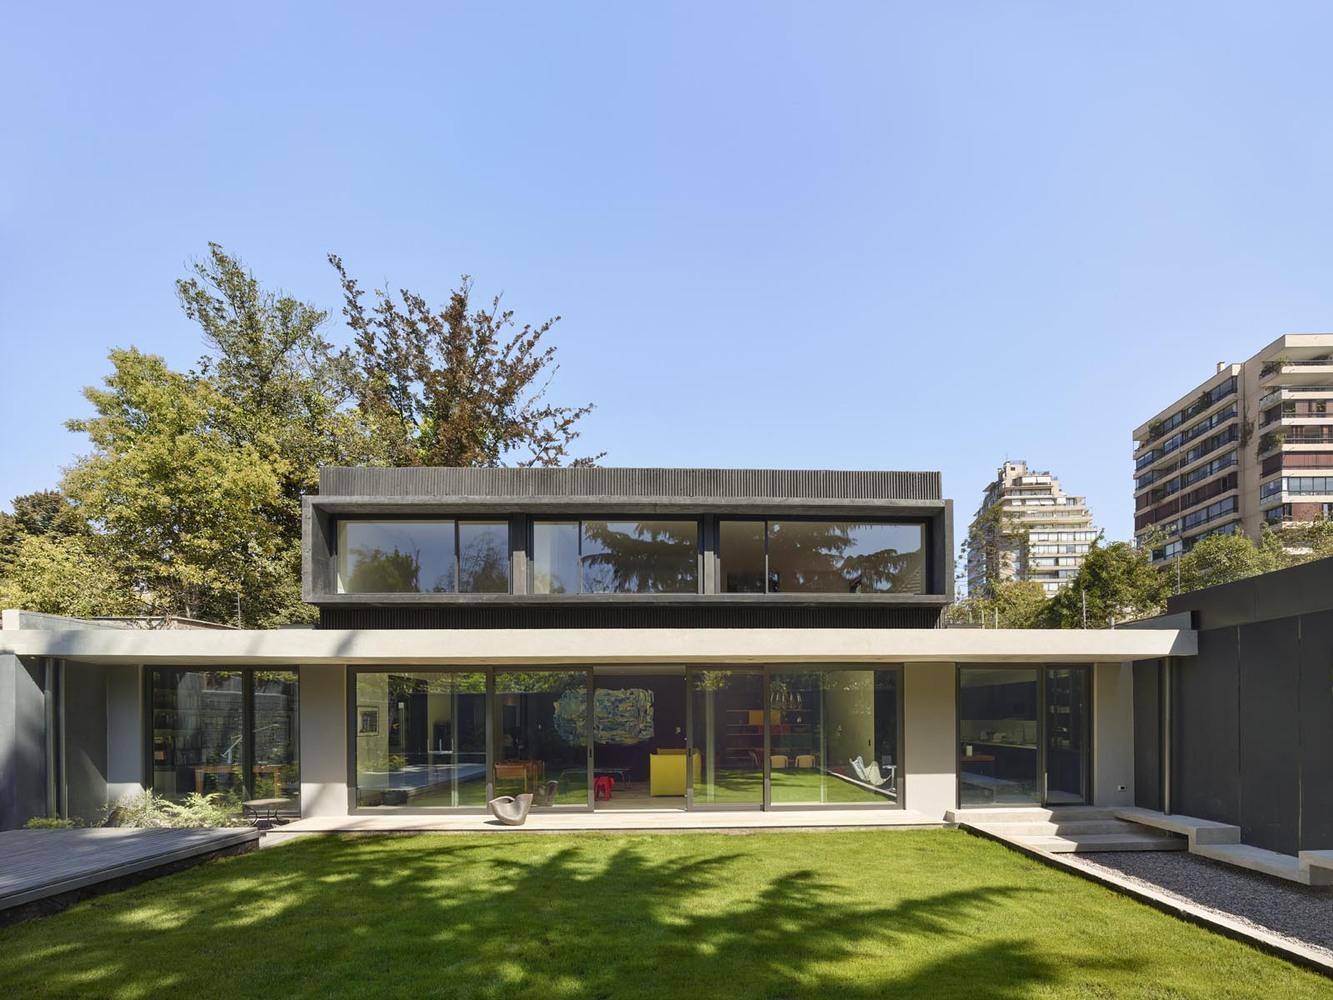 Malaga house prietoschaffer arquitectos building of - Arquitectos interioristas malaga ...